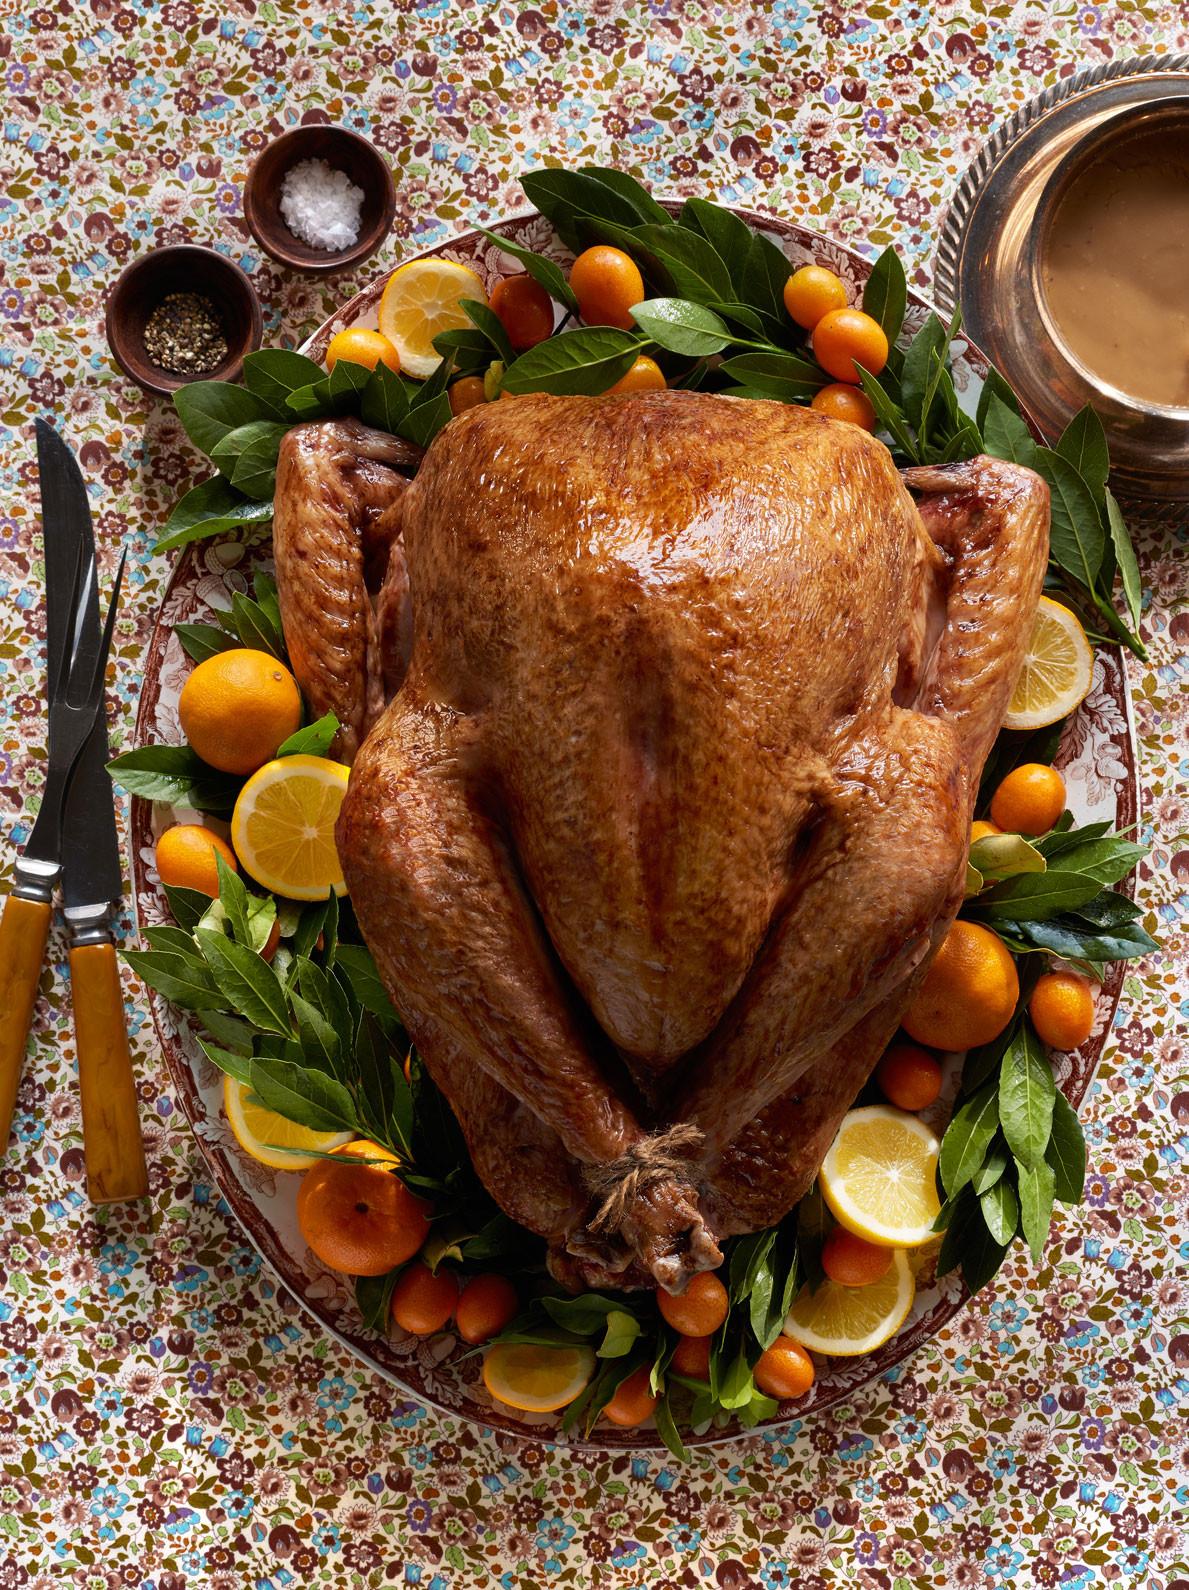 Turkey Thanksgiving Picture  25 Best Thanksgiving Turkey Recipes How To Cook Turkey